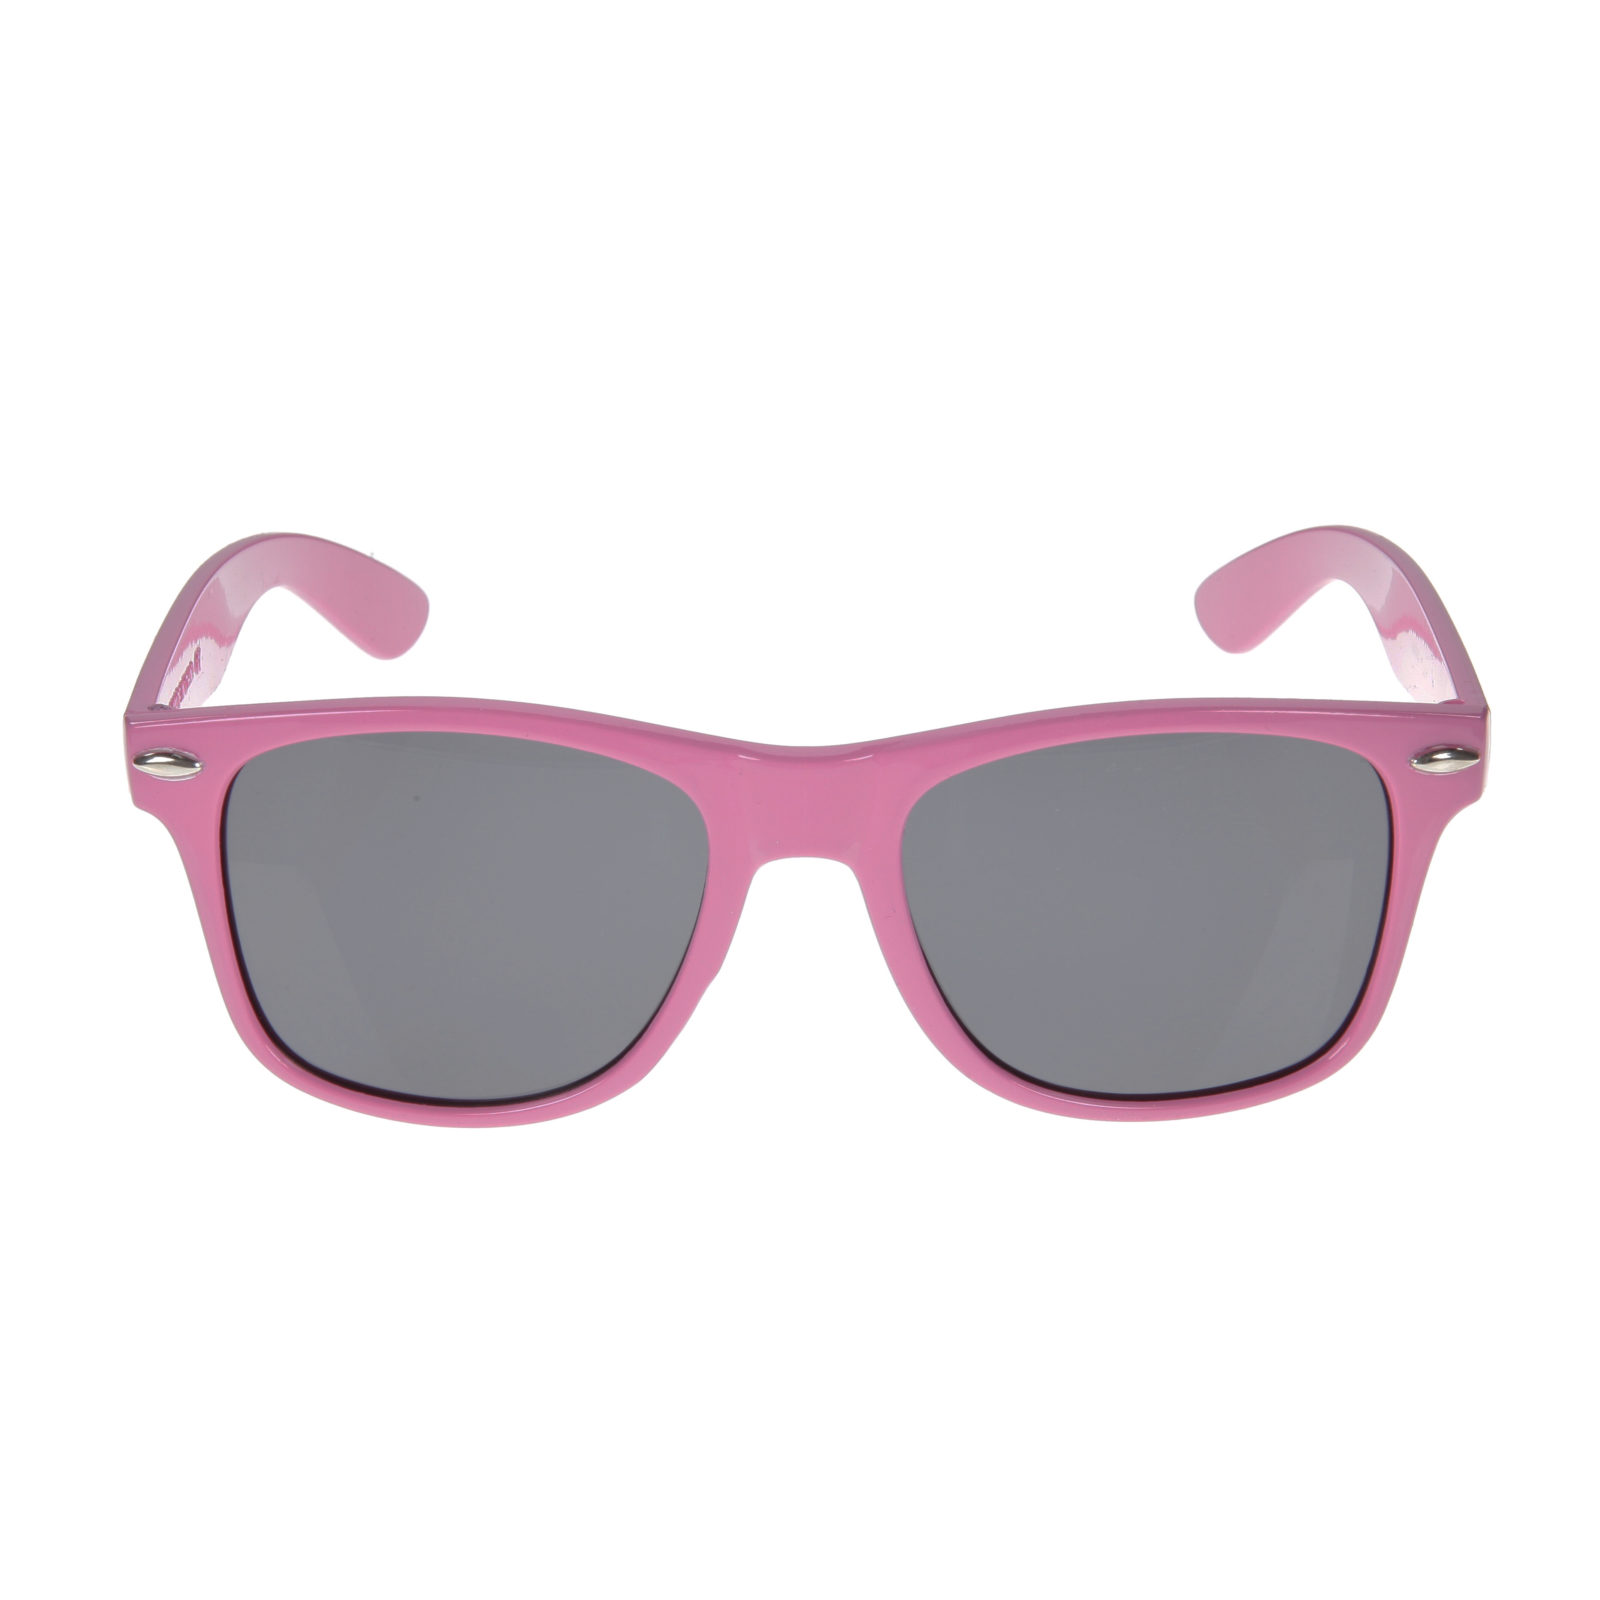 Tuotekuva: Persauki Yacht Club – Reipan aurinkolasit baby pink